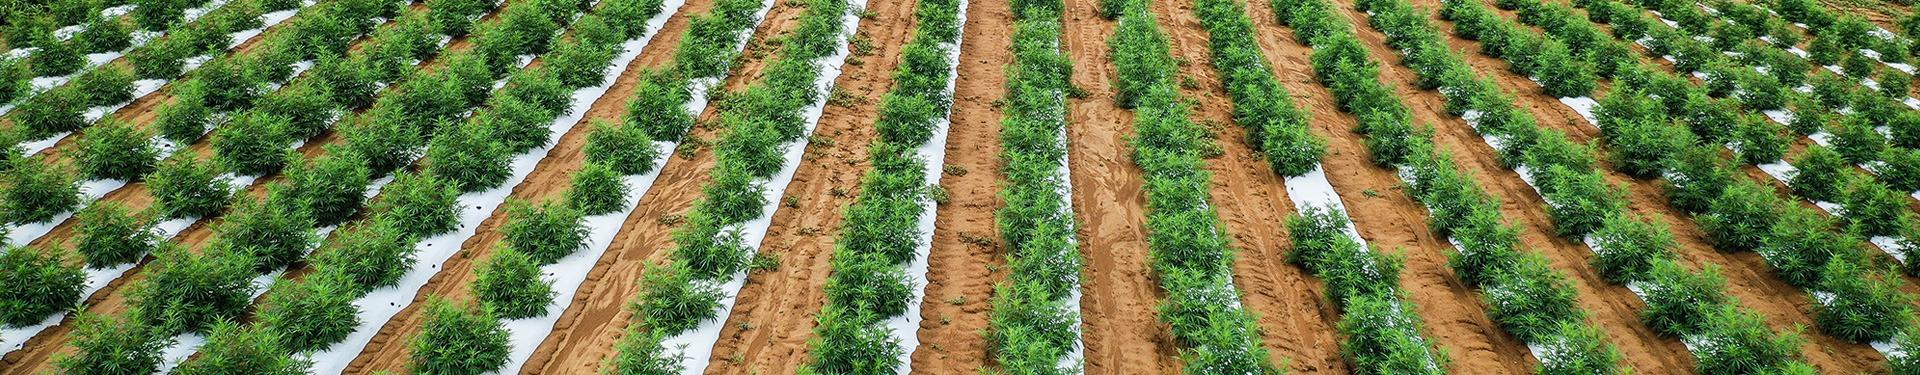 Hemp Farming Field - Contact